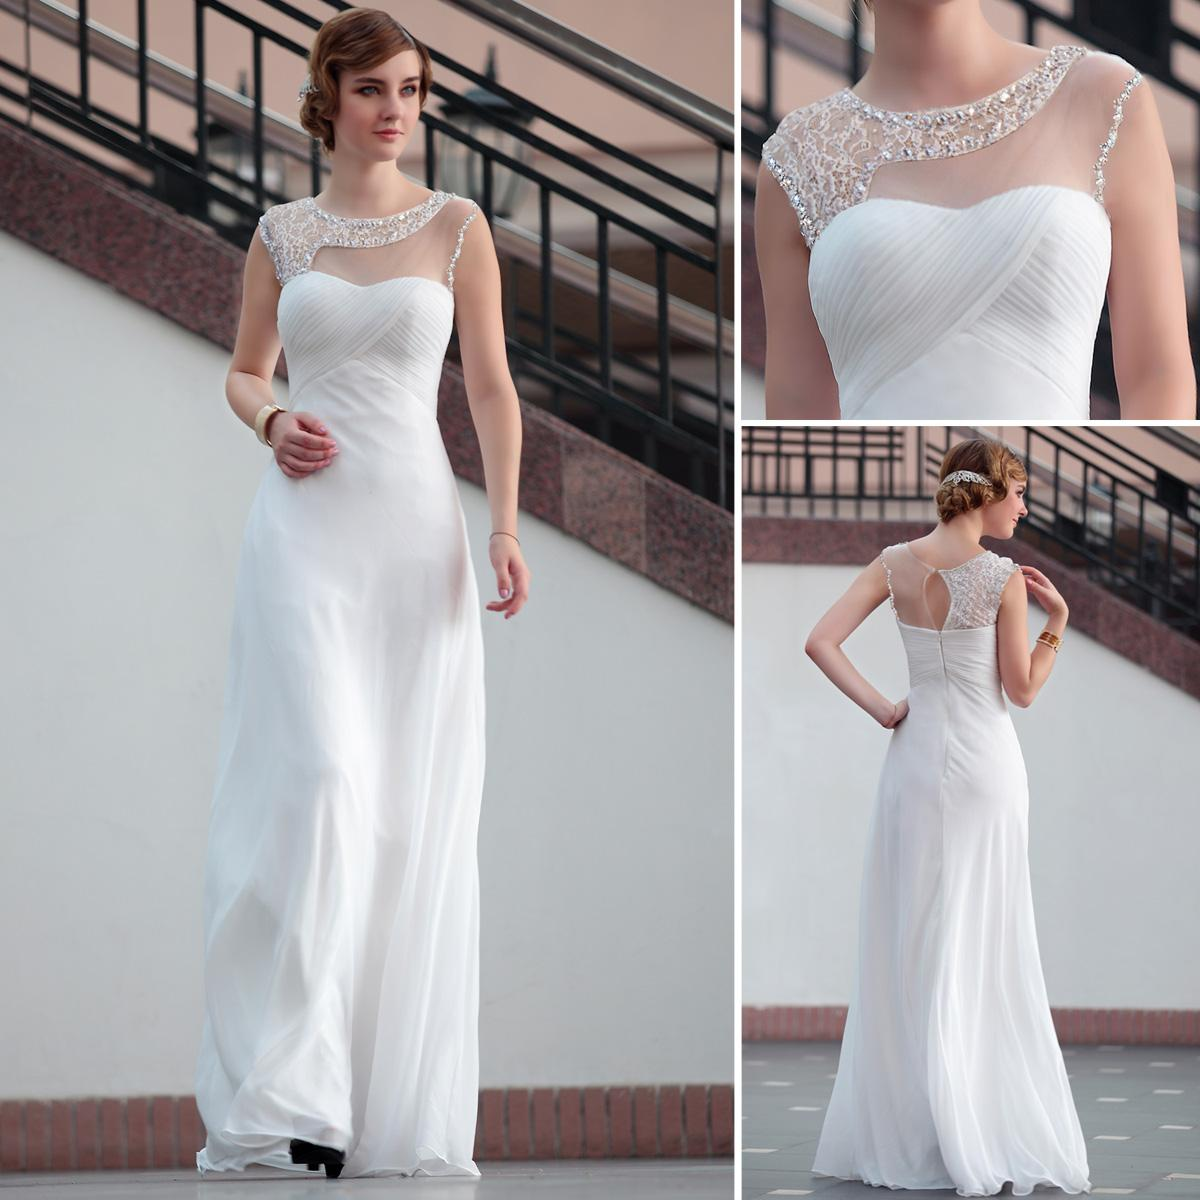 naya dress reception wedding dresses Adrianna Papell Ivory Nude Naya Dress BHLDN